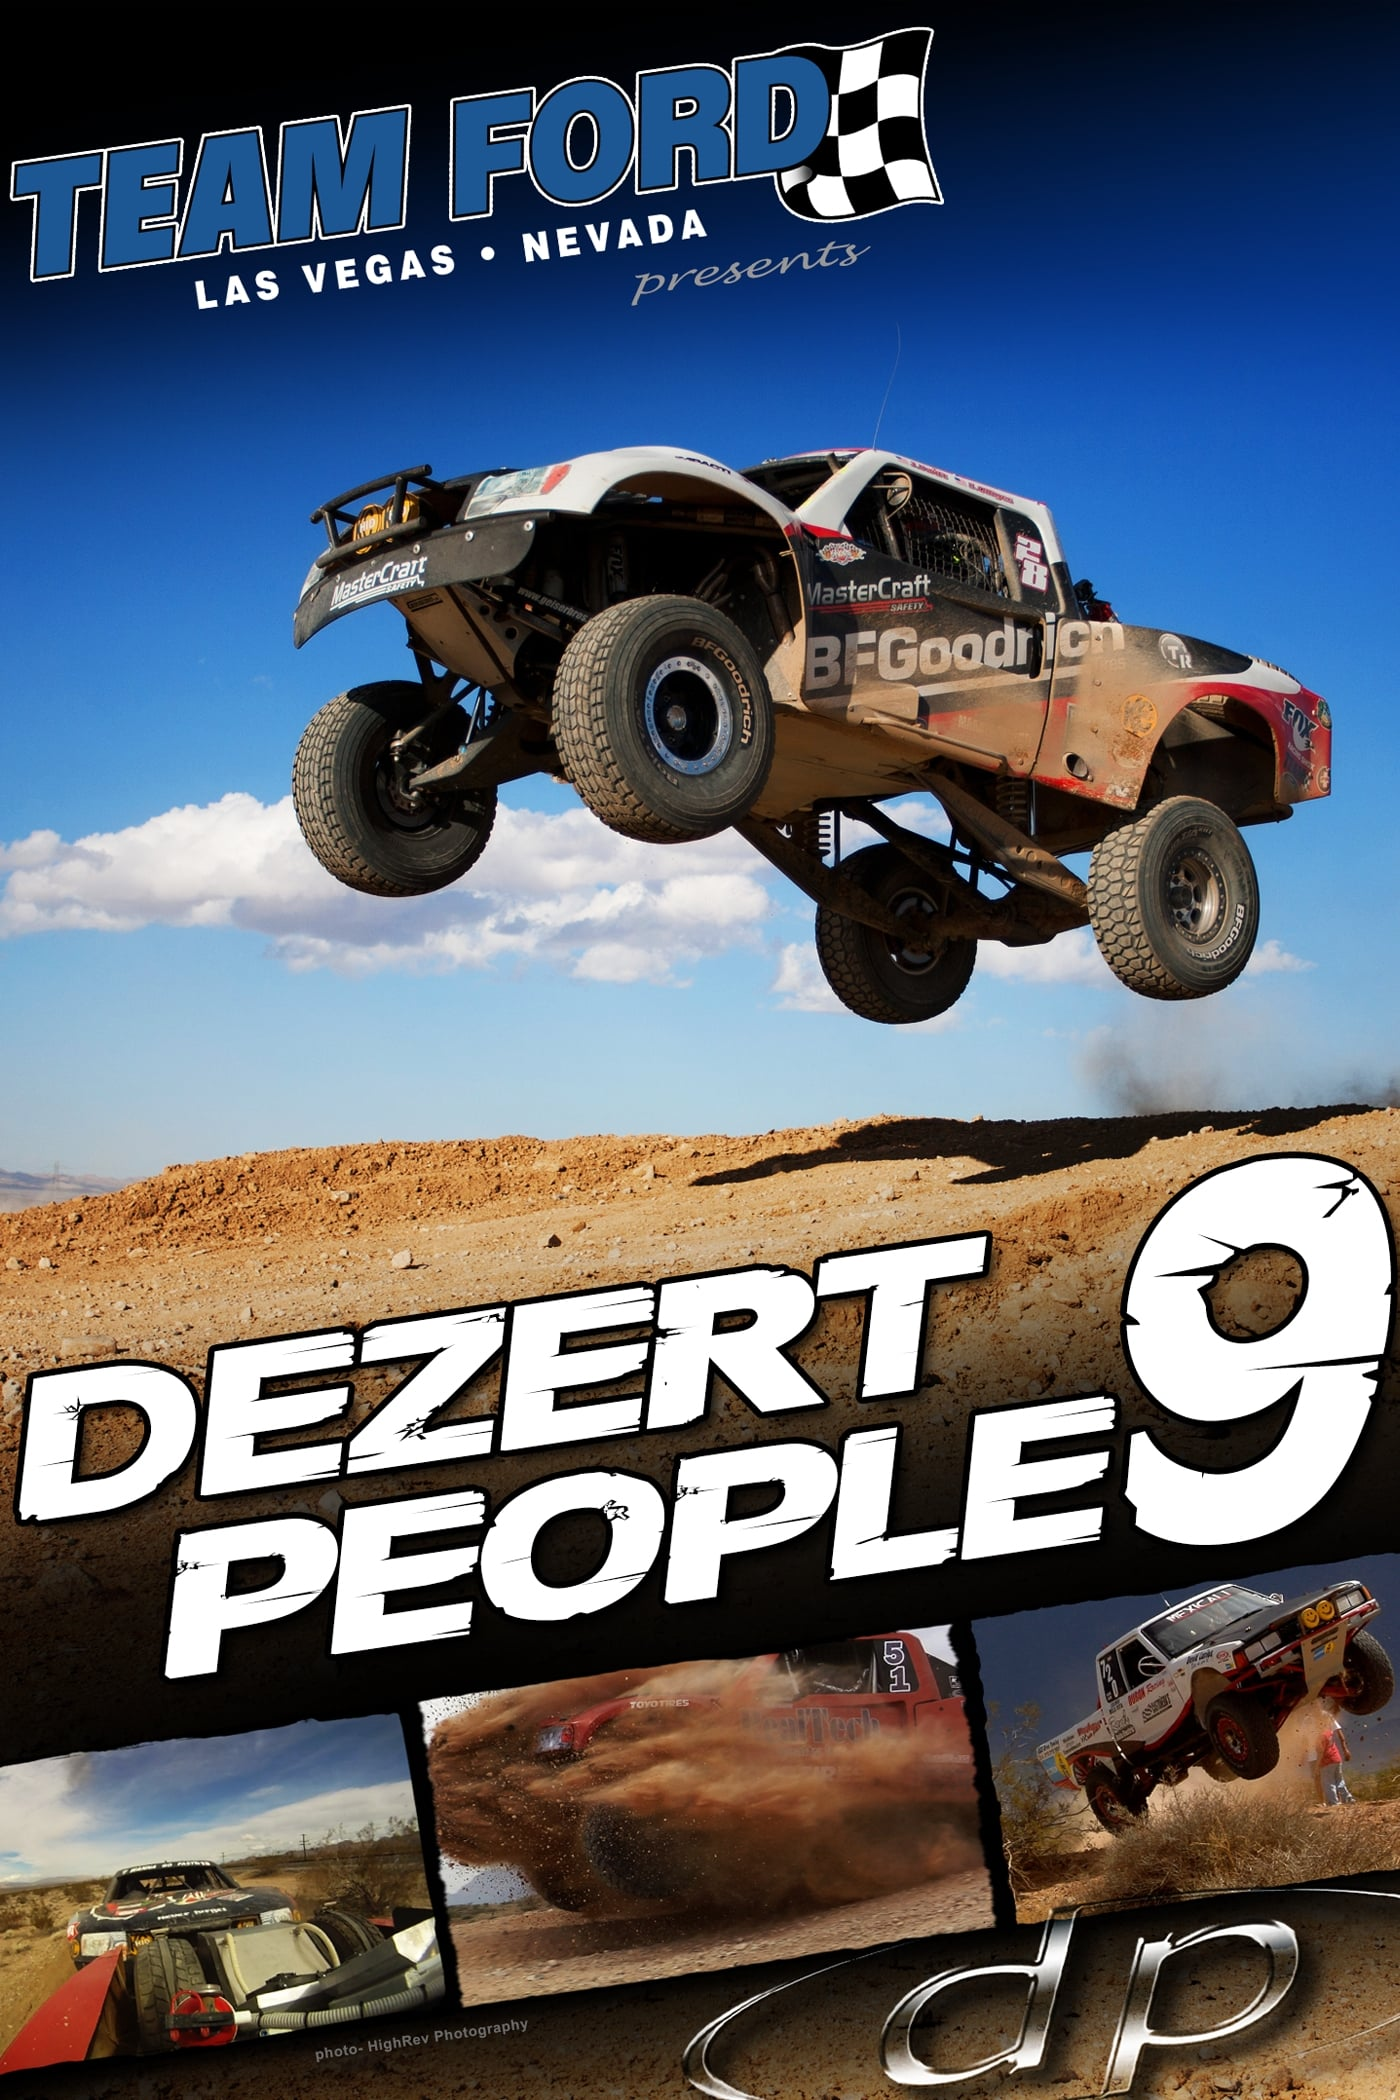 Dezert People 9 on FREECABLE TV